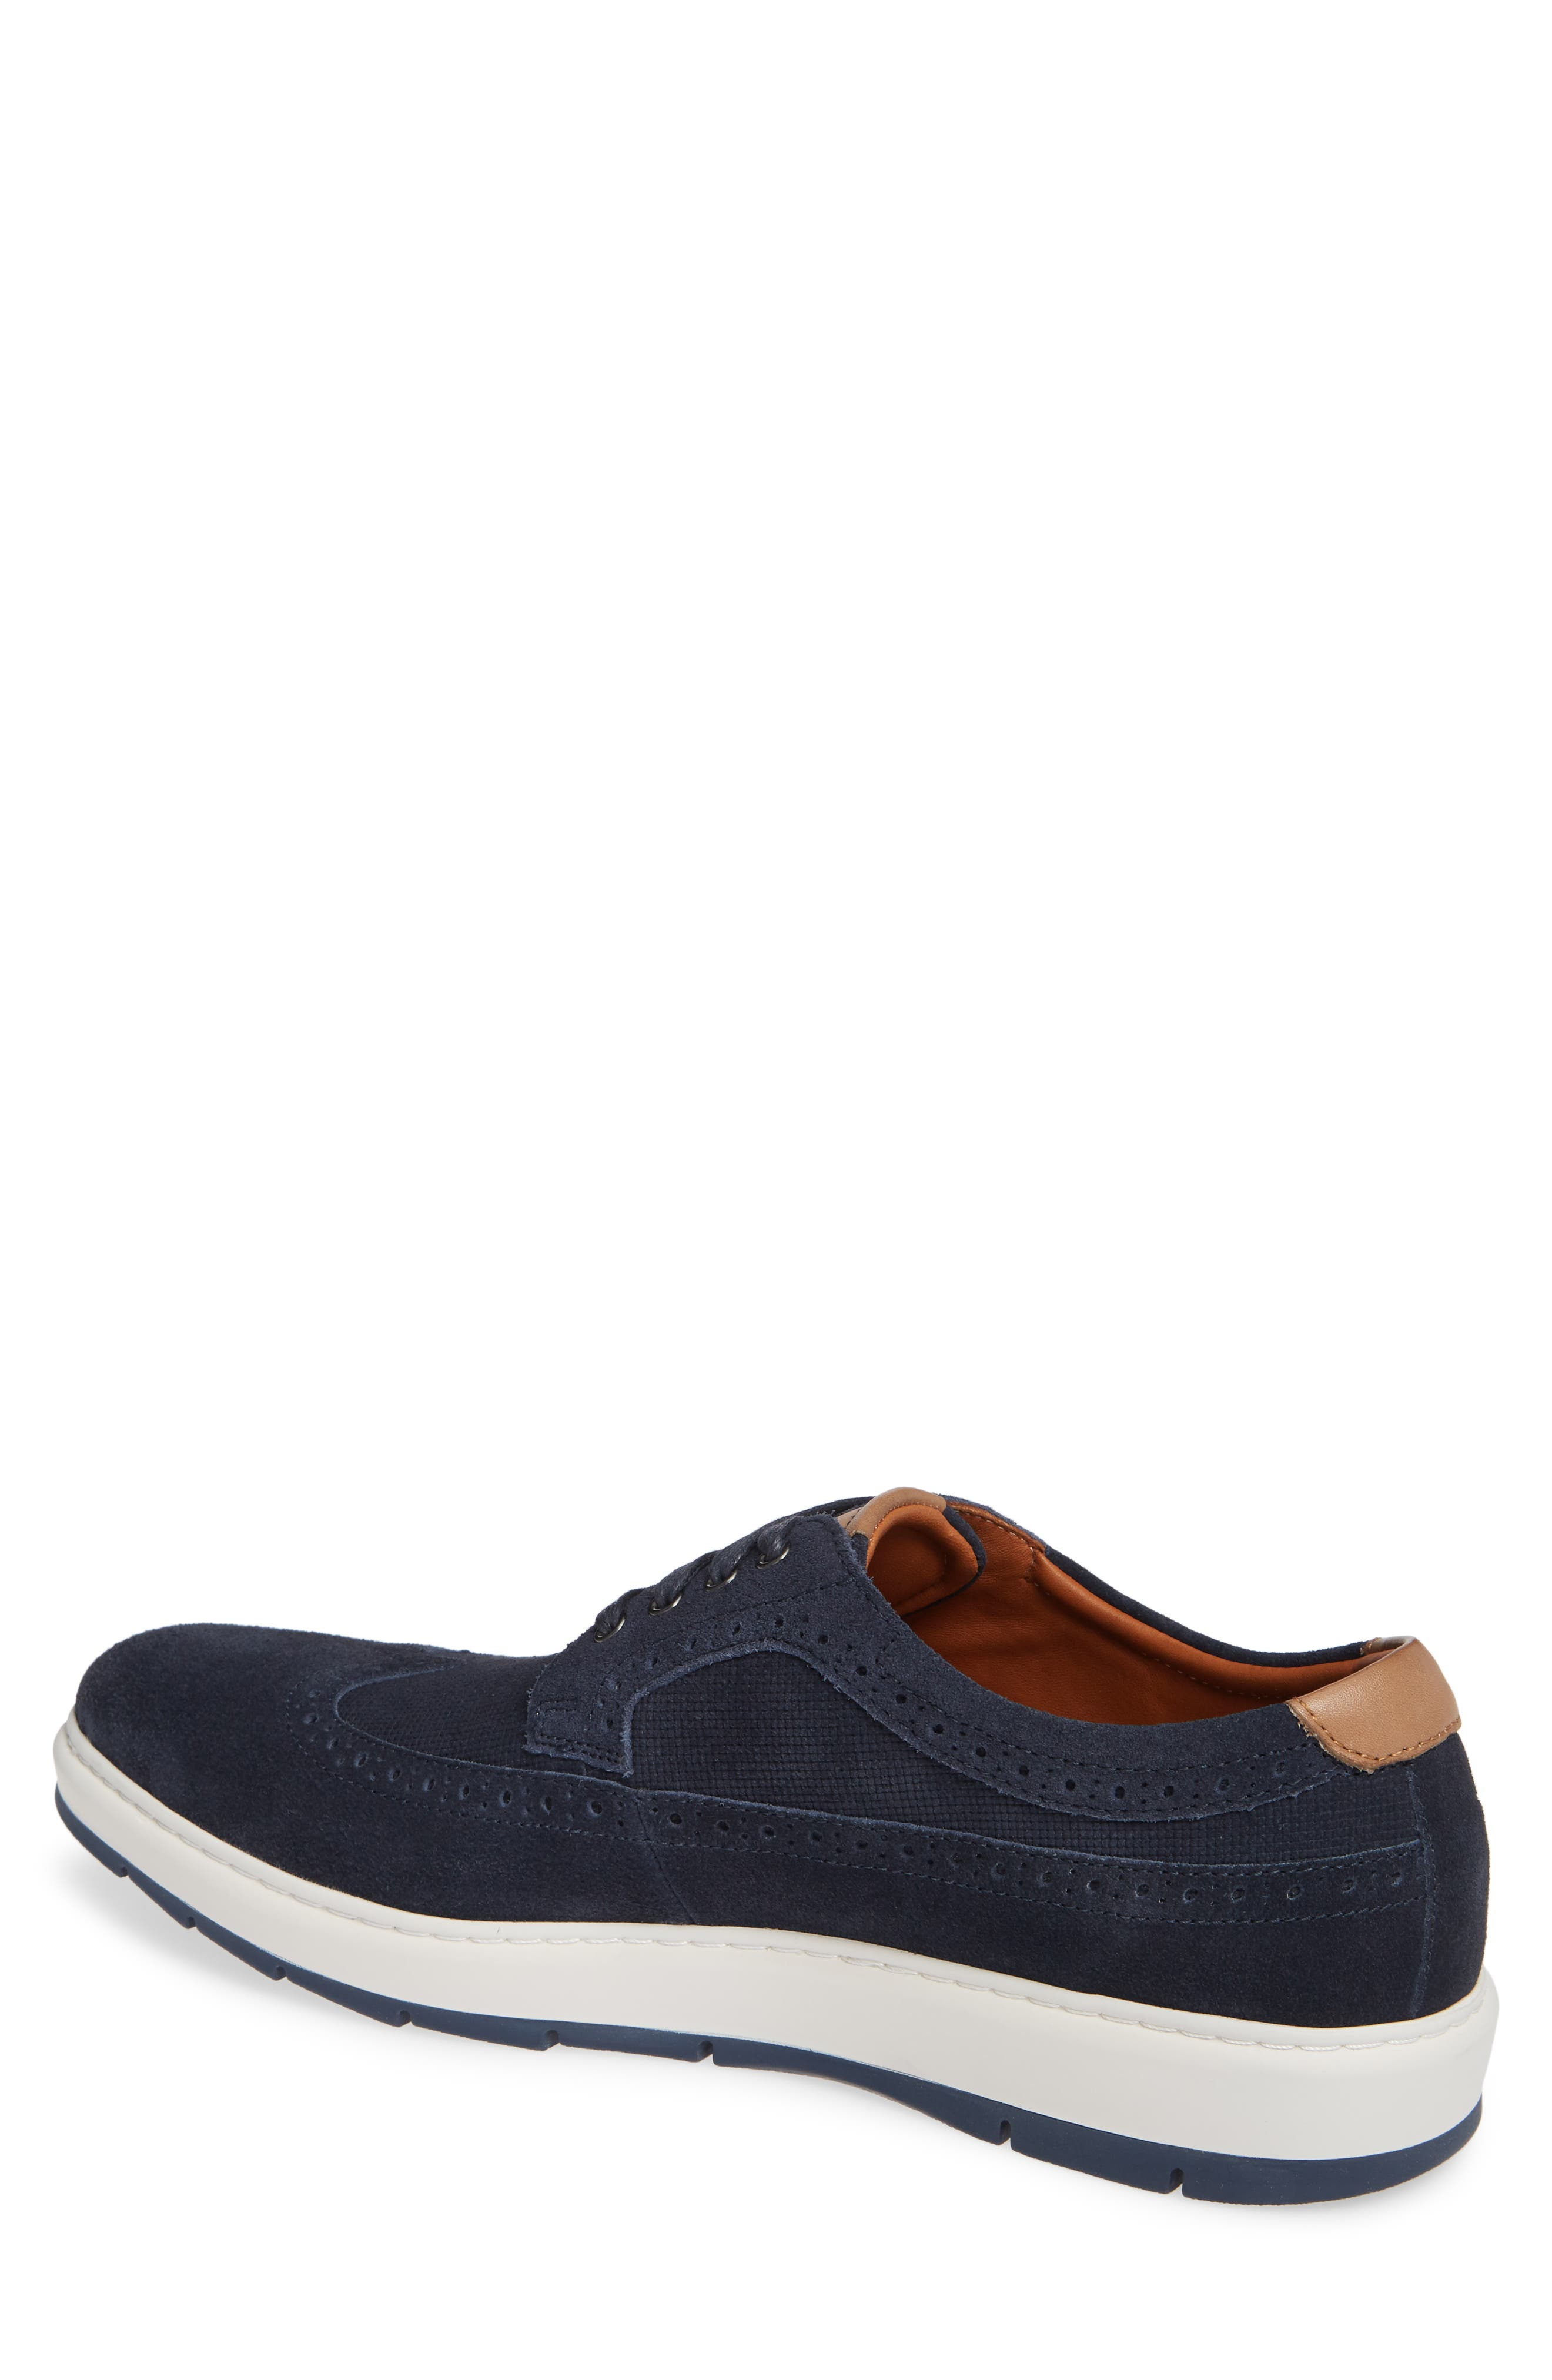 Elliston Wingtip Sneaker,                             Alternate thumbnail 2, color,                             NAVY SUEDE